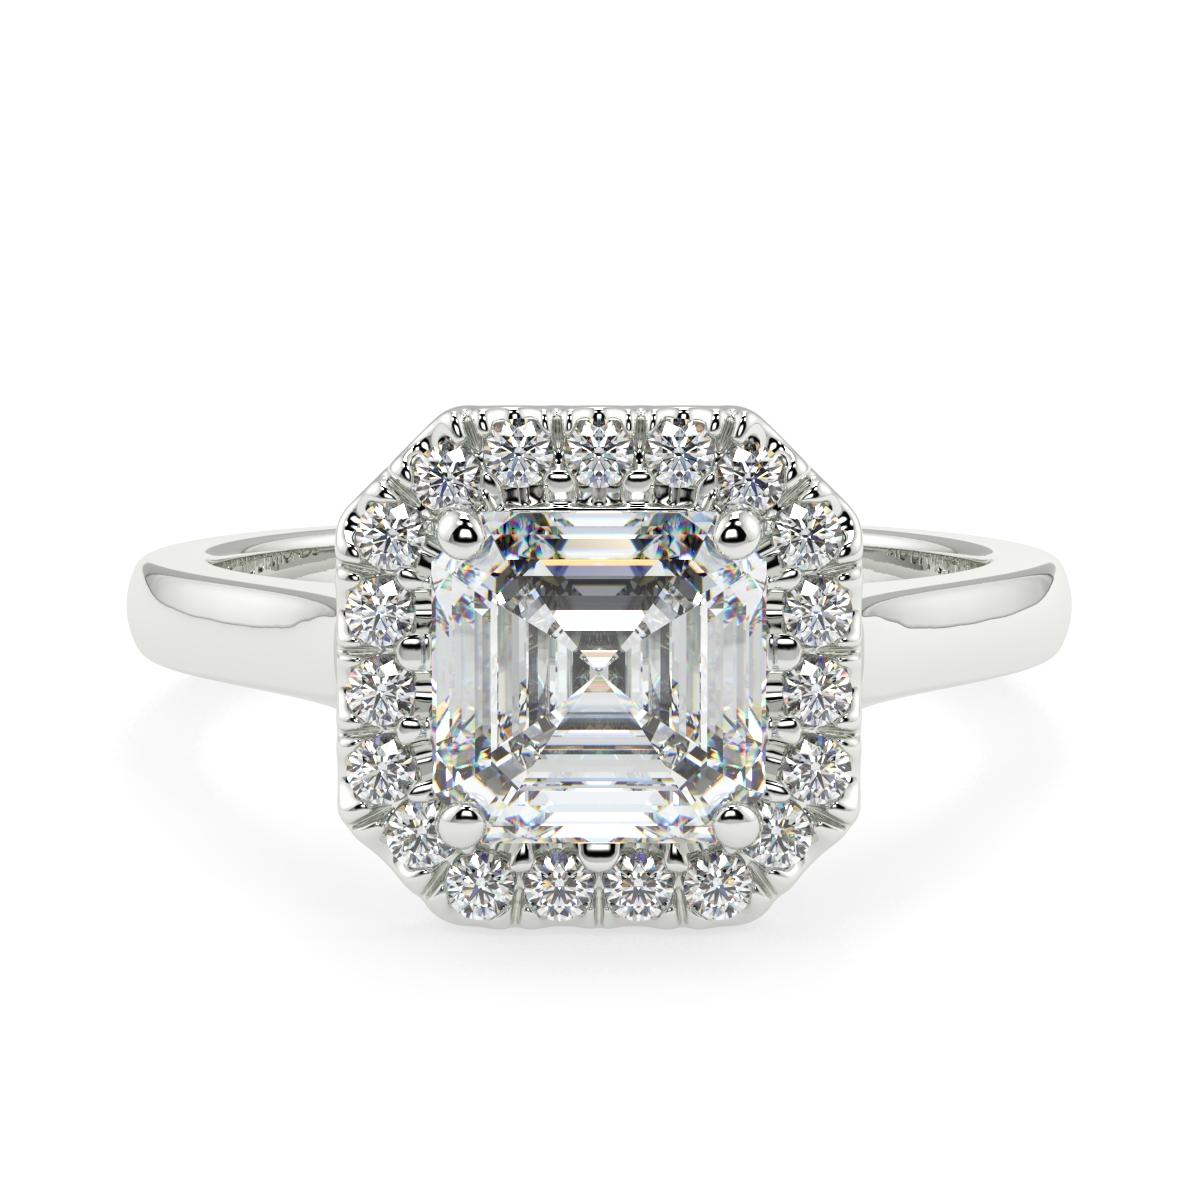 Assher Halo Microset Diamond Ring